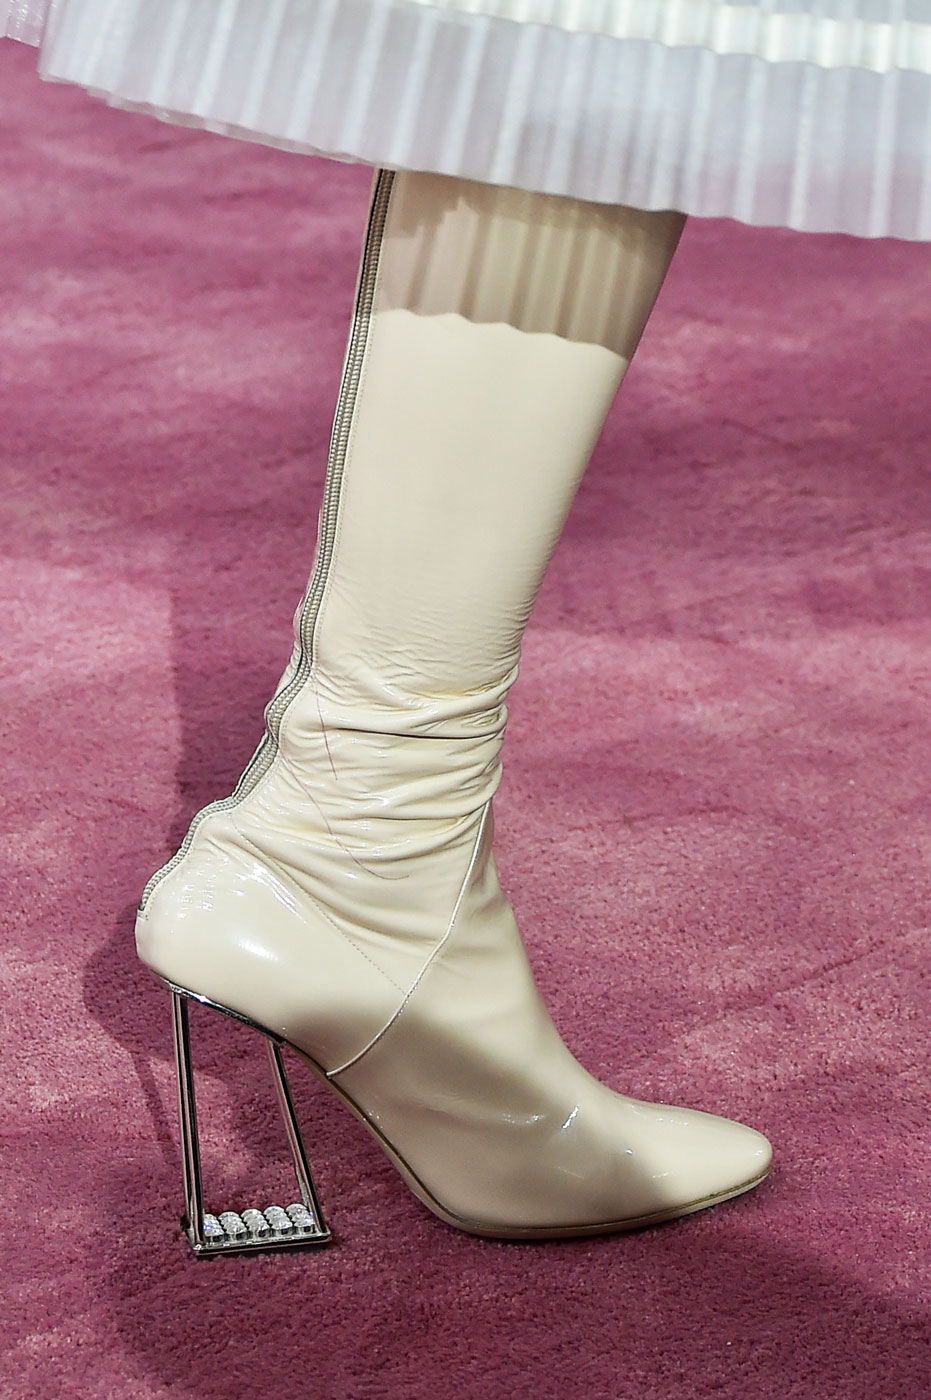 Christian-Dior-fashion-runway-show-close-ups-haute-couture-paris-spring-summer-2015-the-impression-144